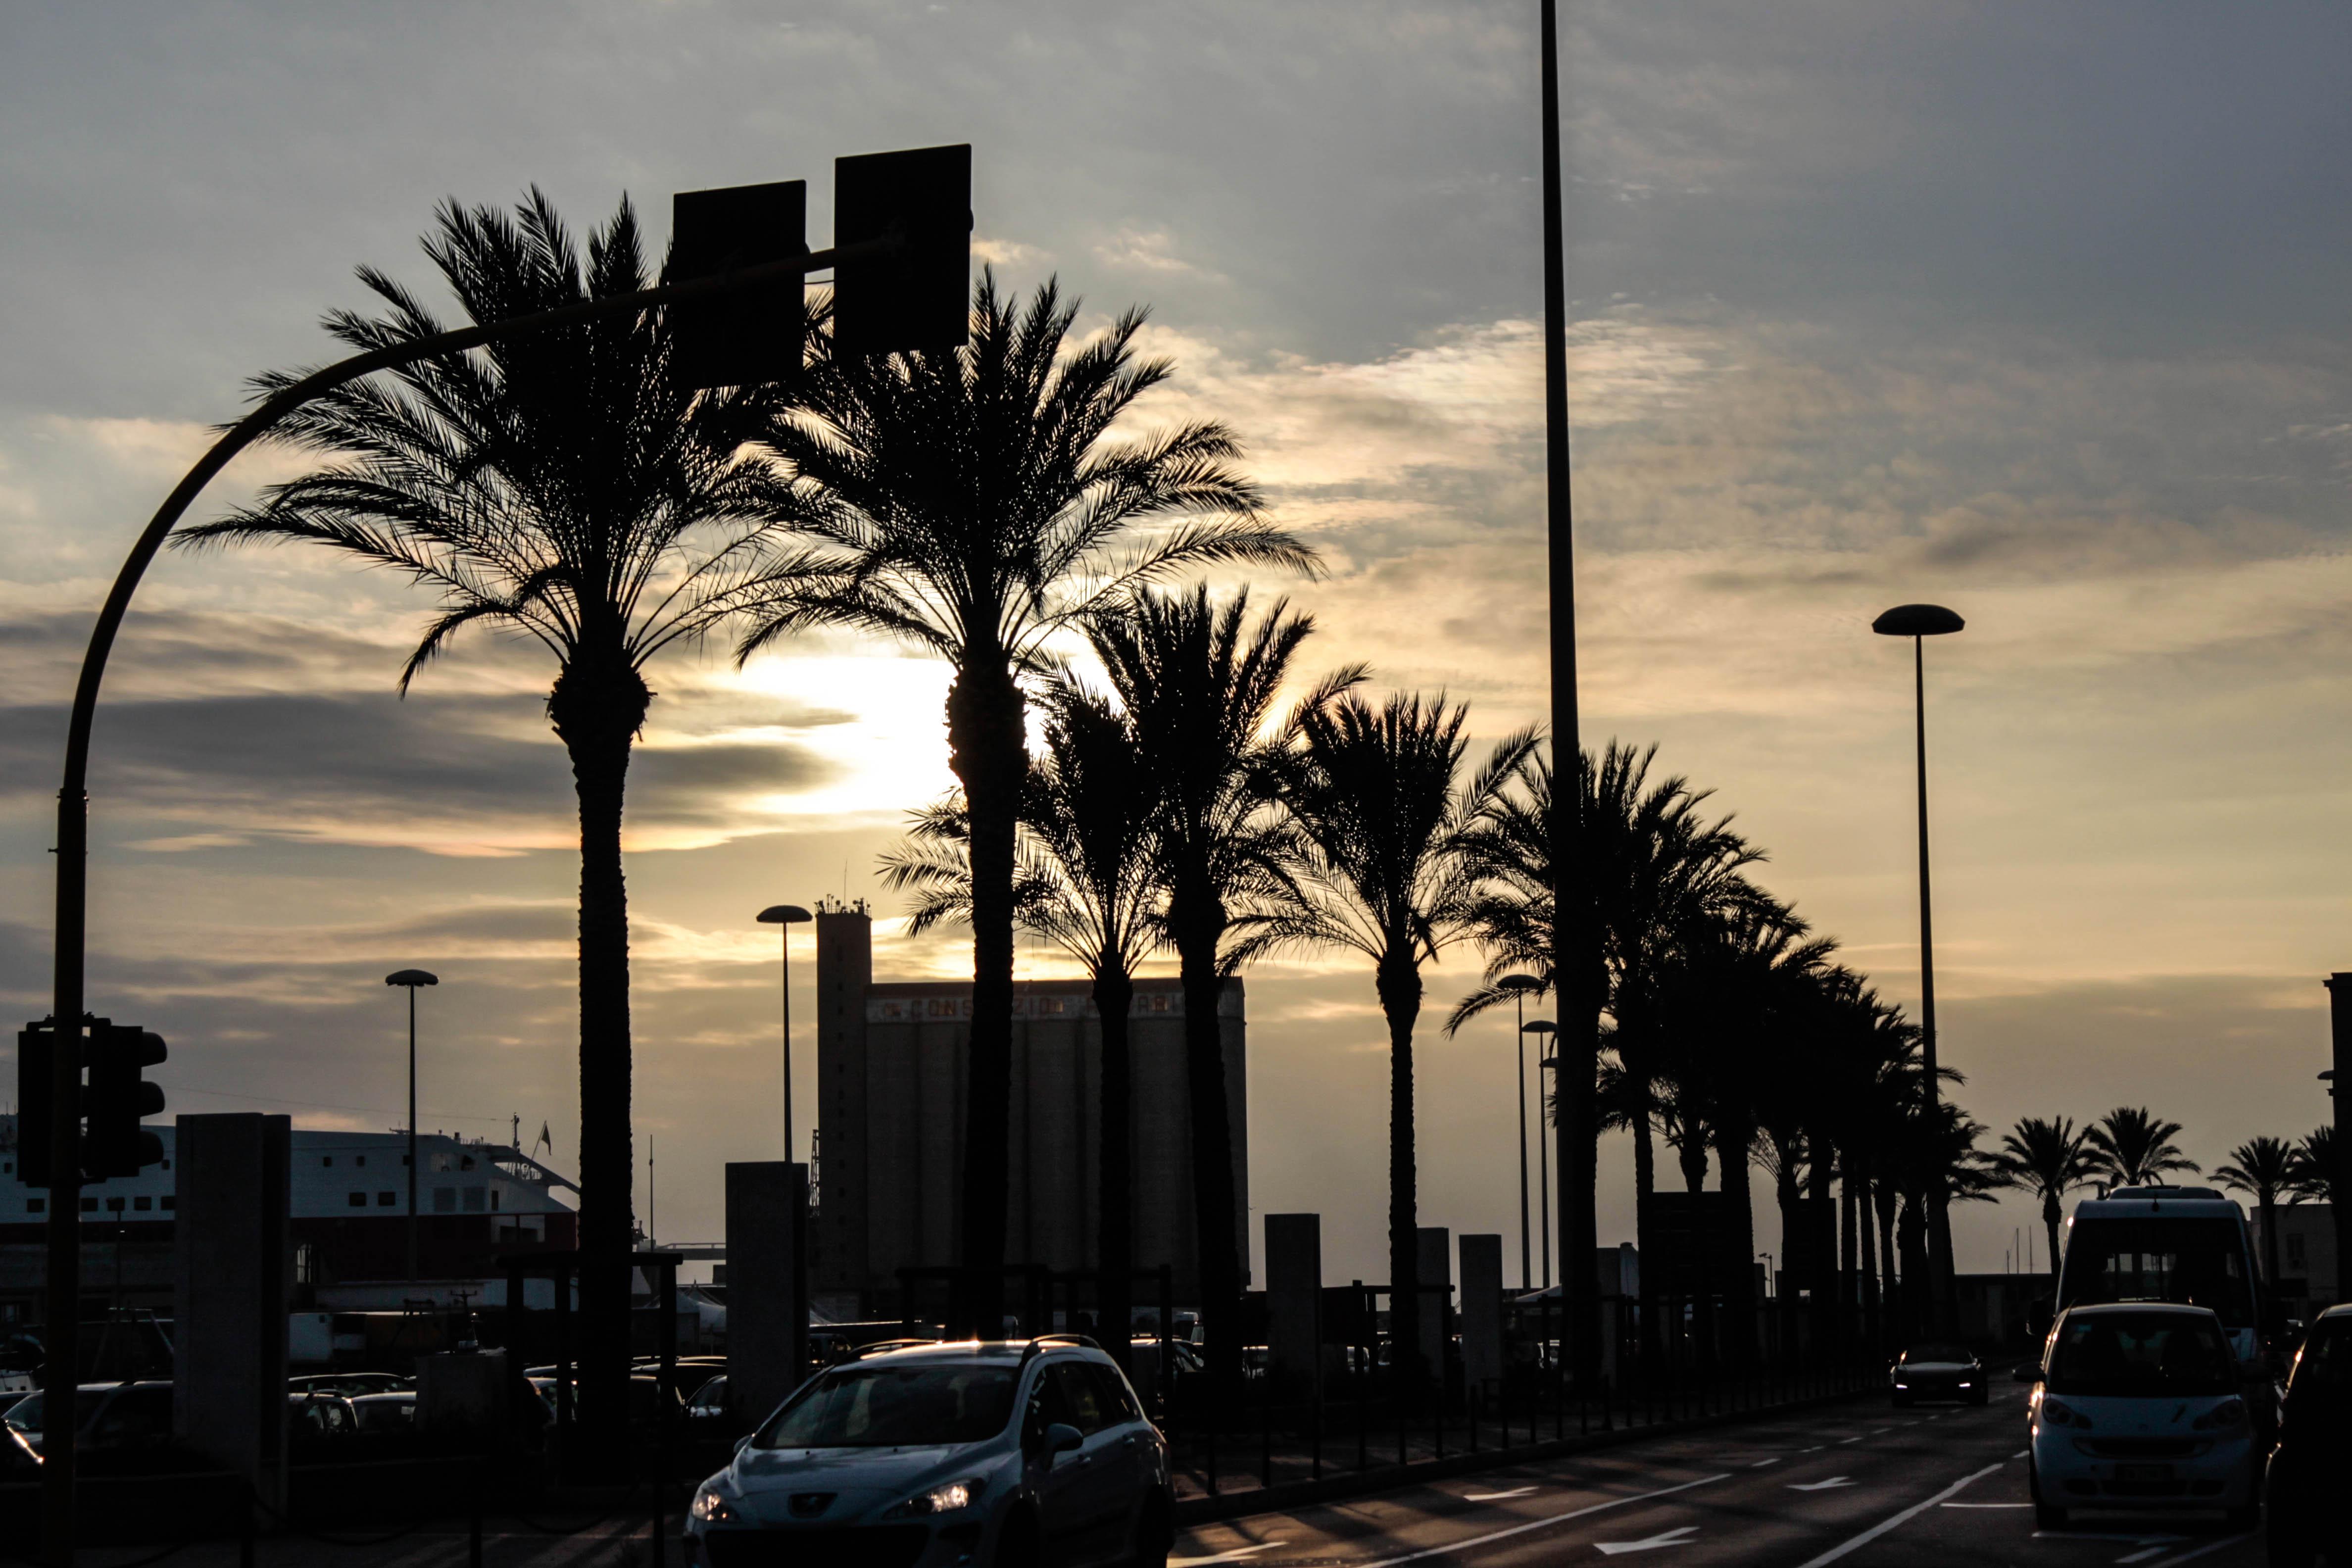 SmellofJasmine_Cagliari_sunset